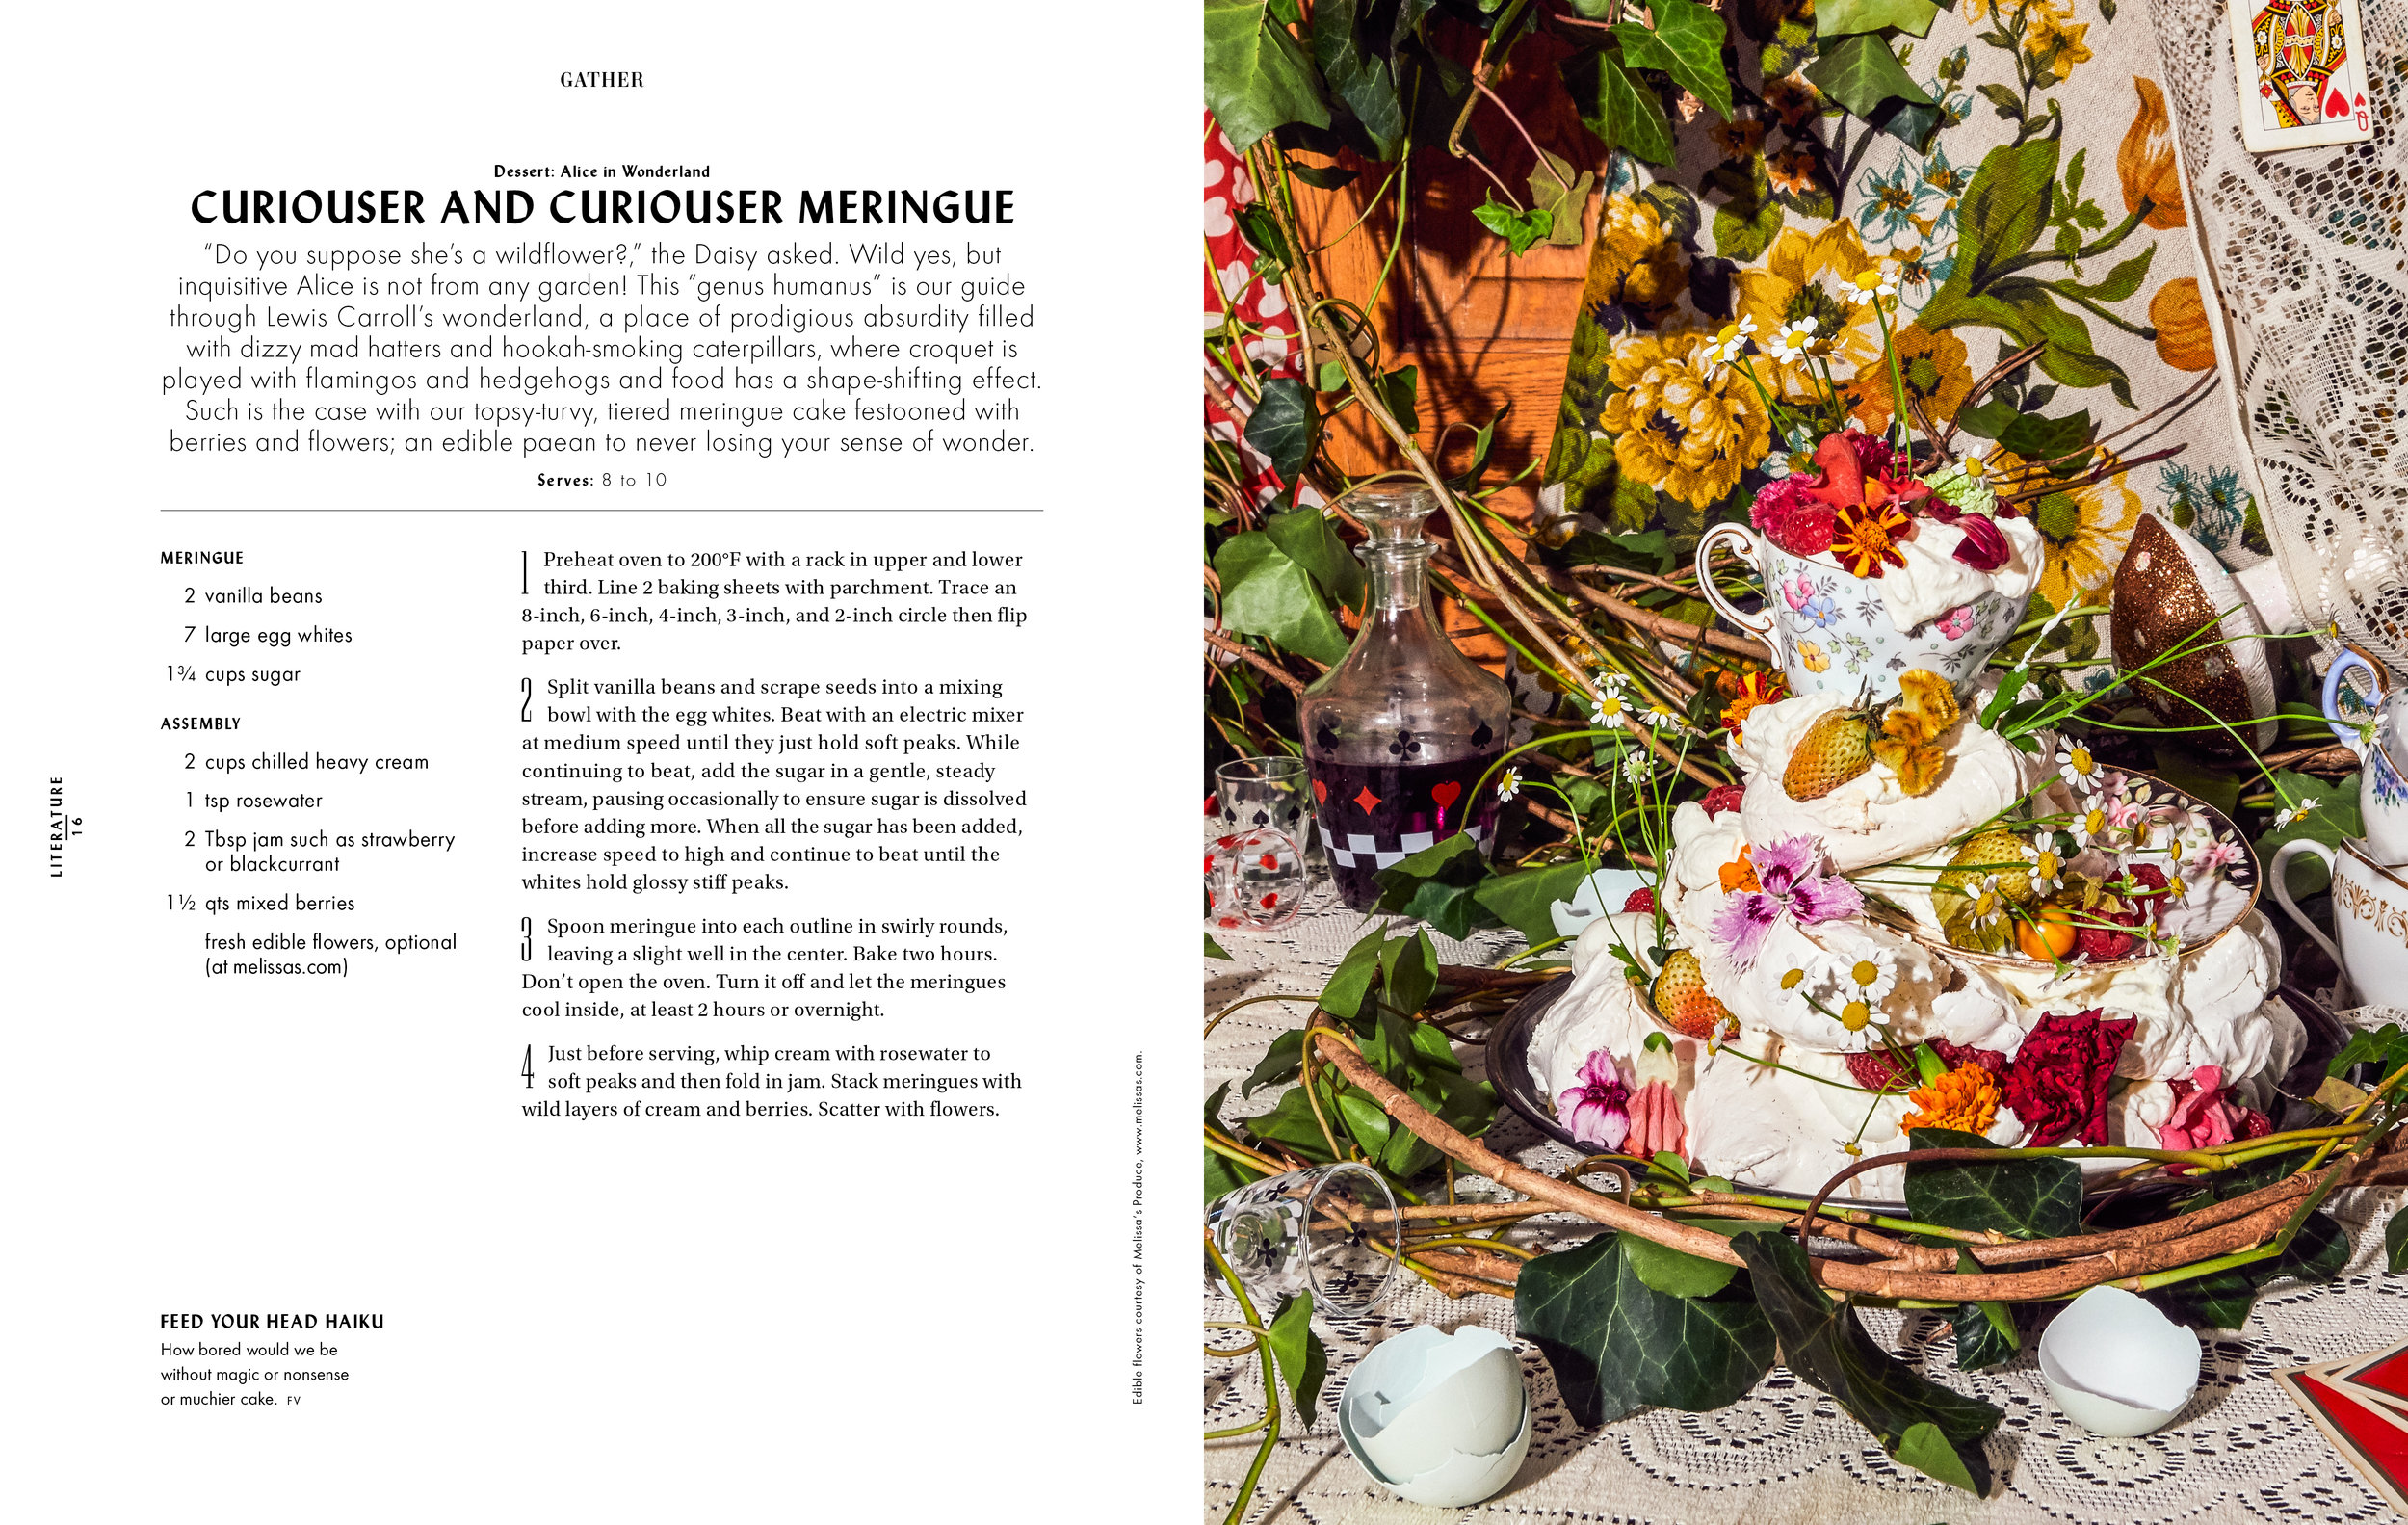 GatherJournal_S17_Heroines_Issue_layout_9.jpg